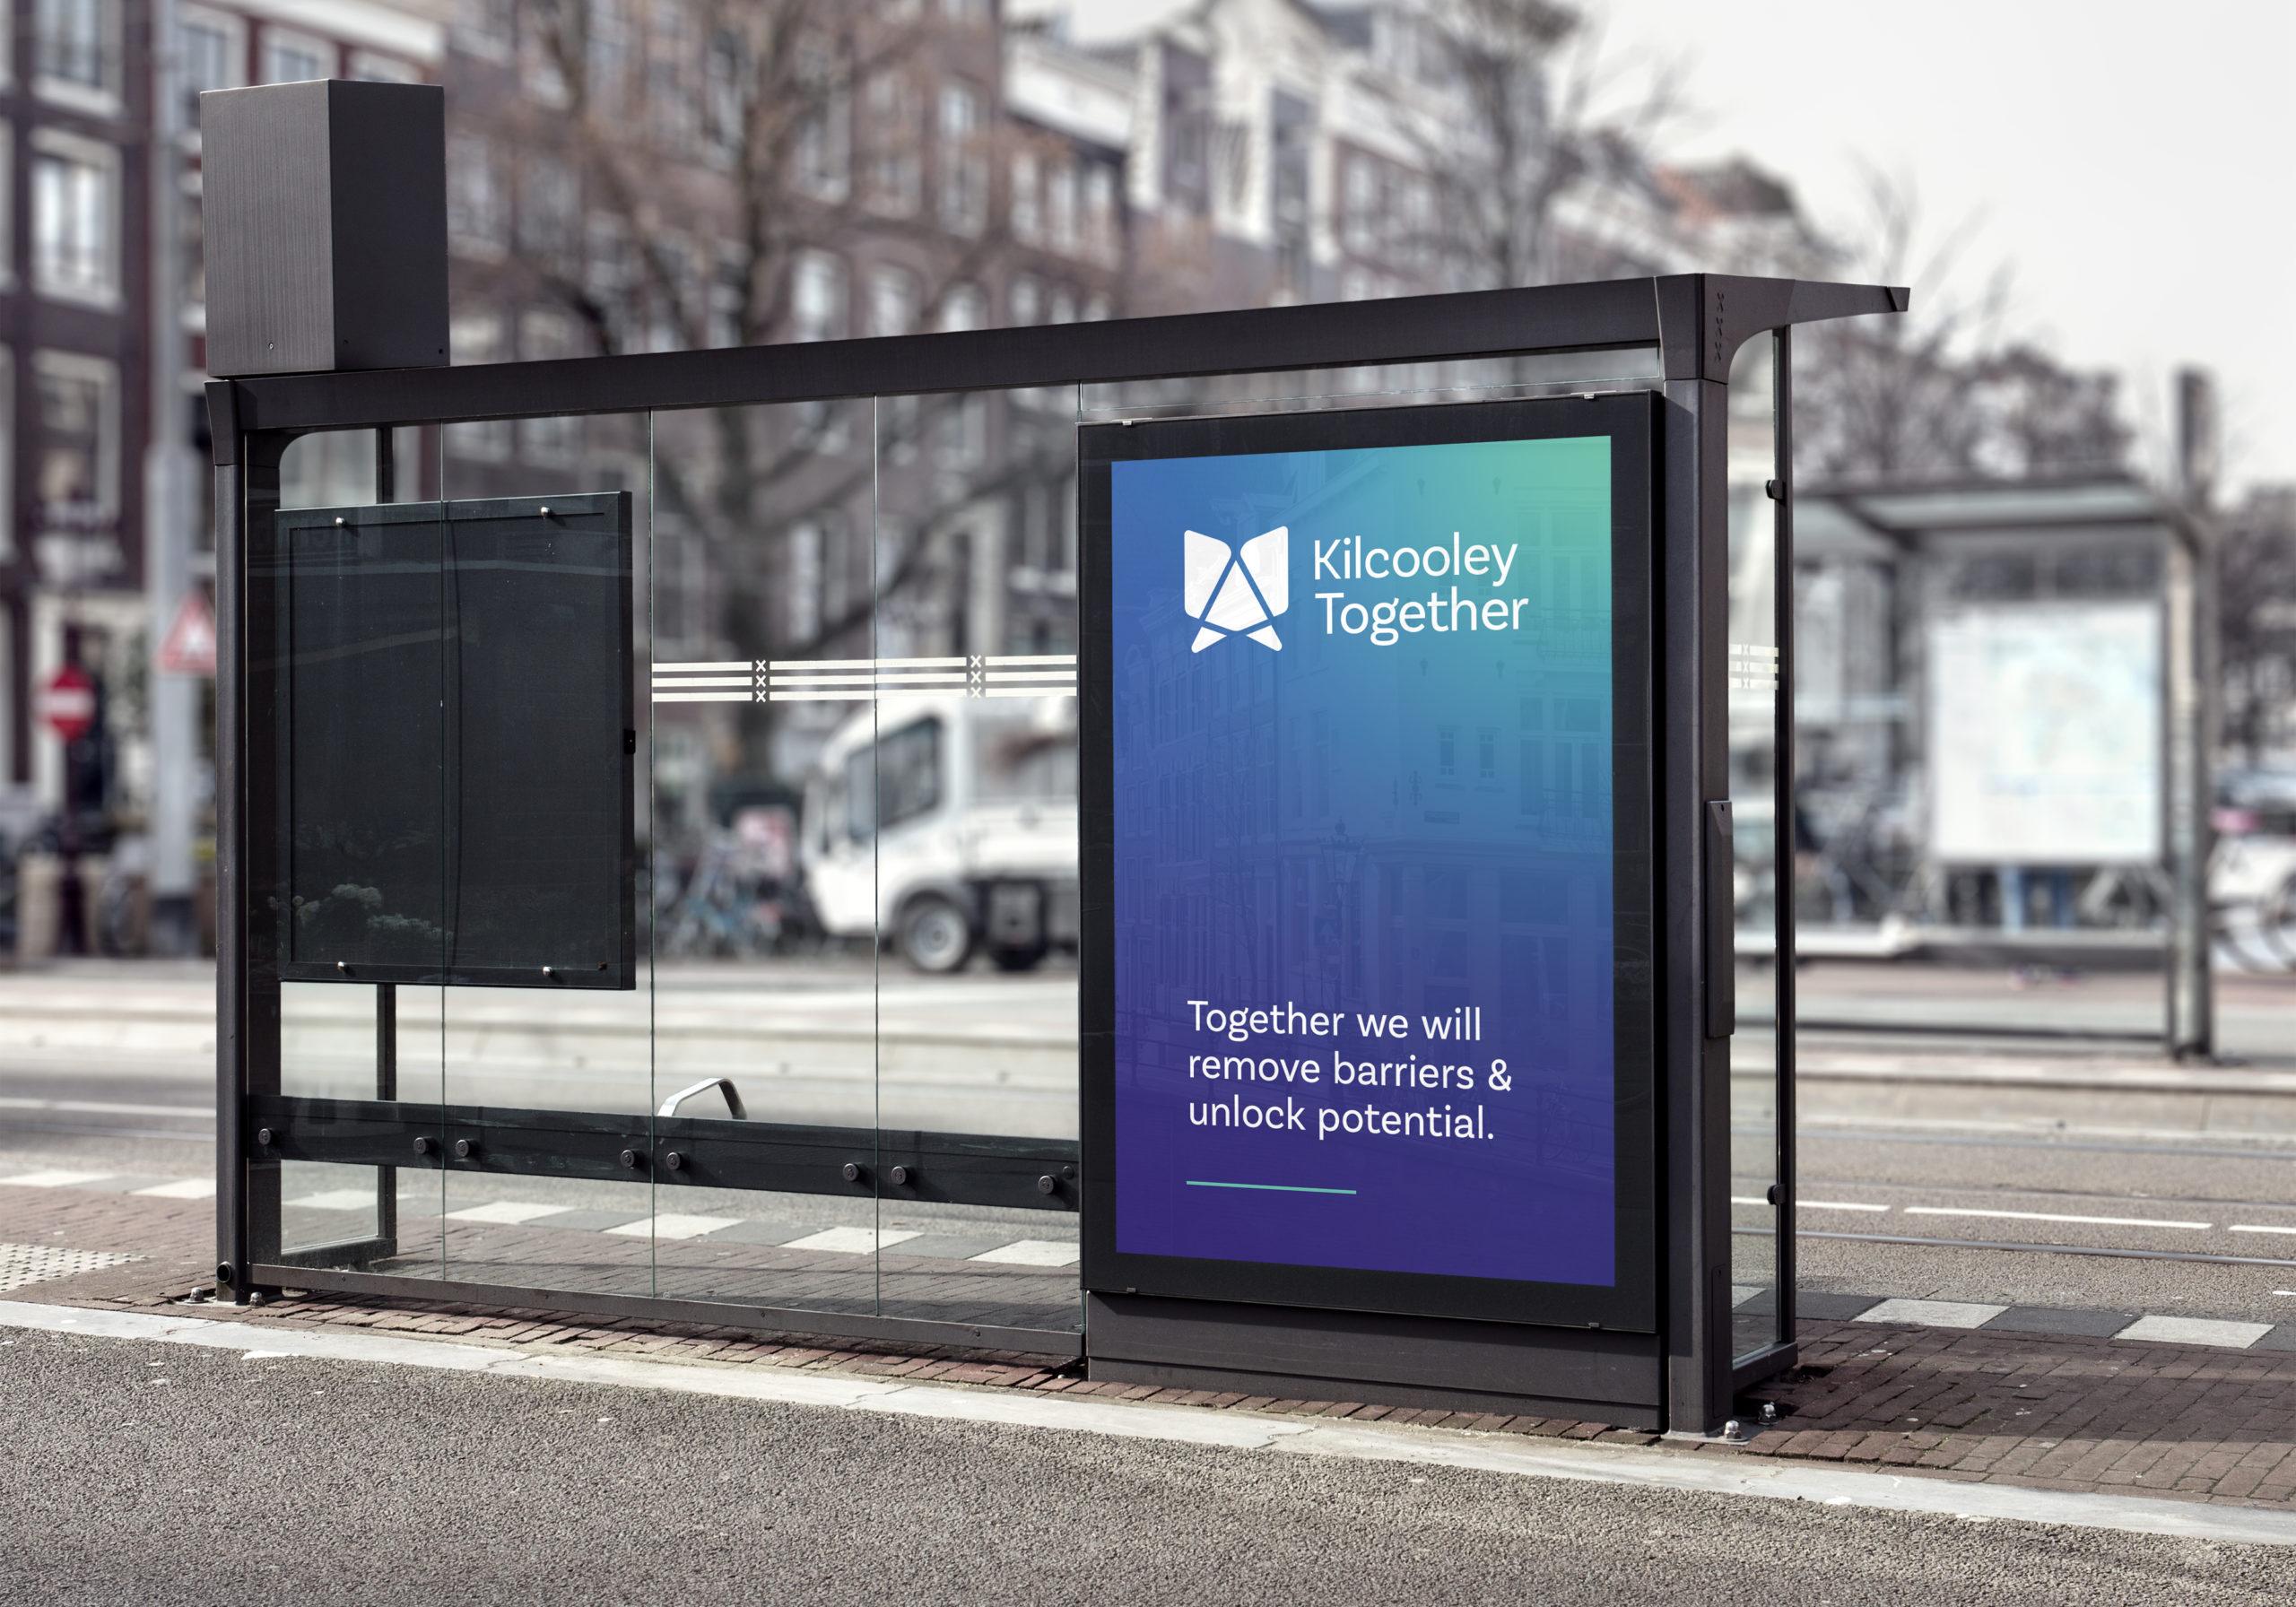 Bus Stop Billboard MockUp 1 kilcooleytogether